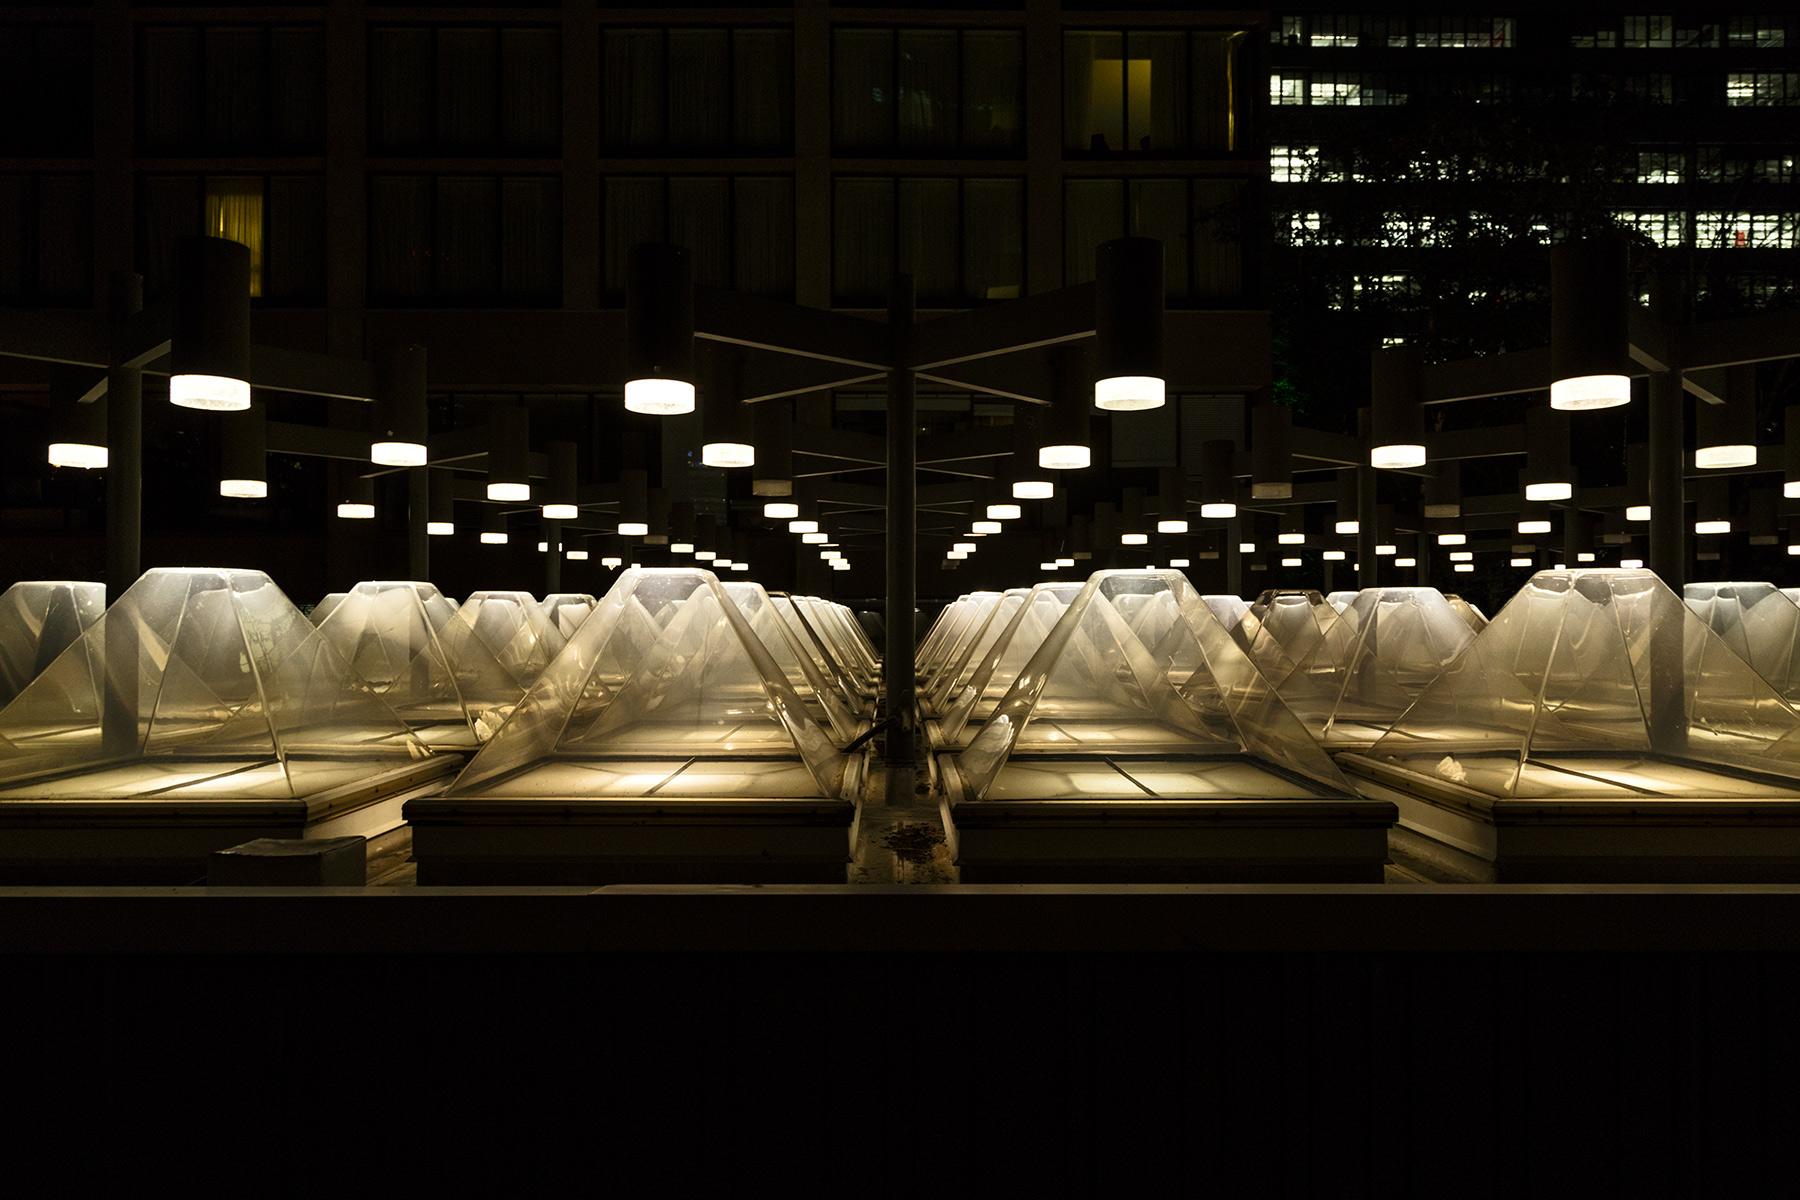 20140927. Toronto's coolest skylight, with its modernist 1972 de